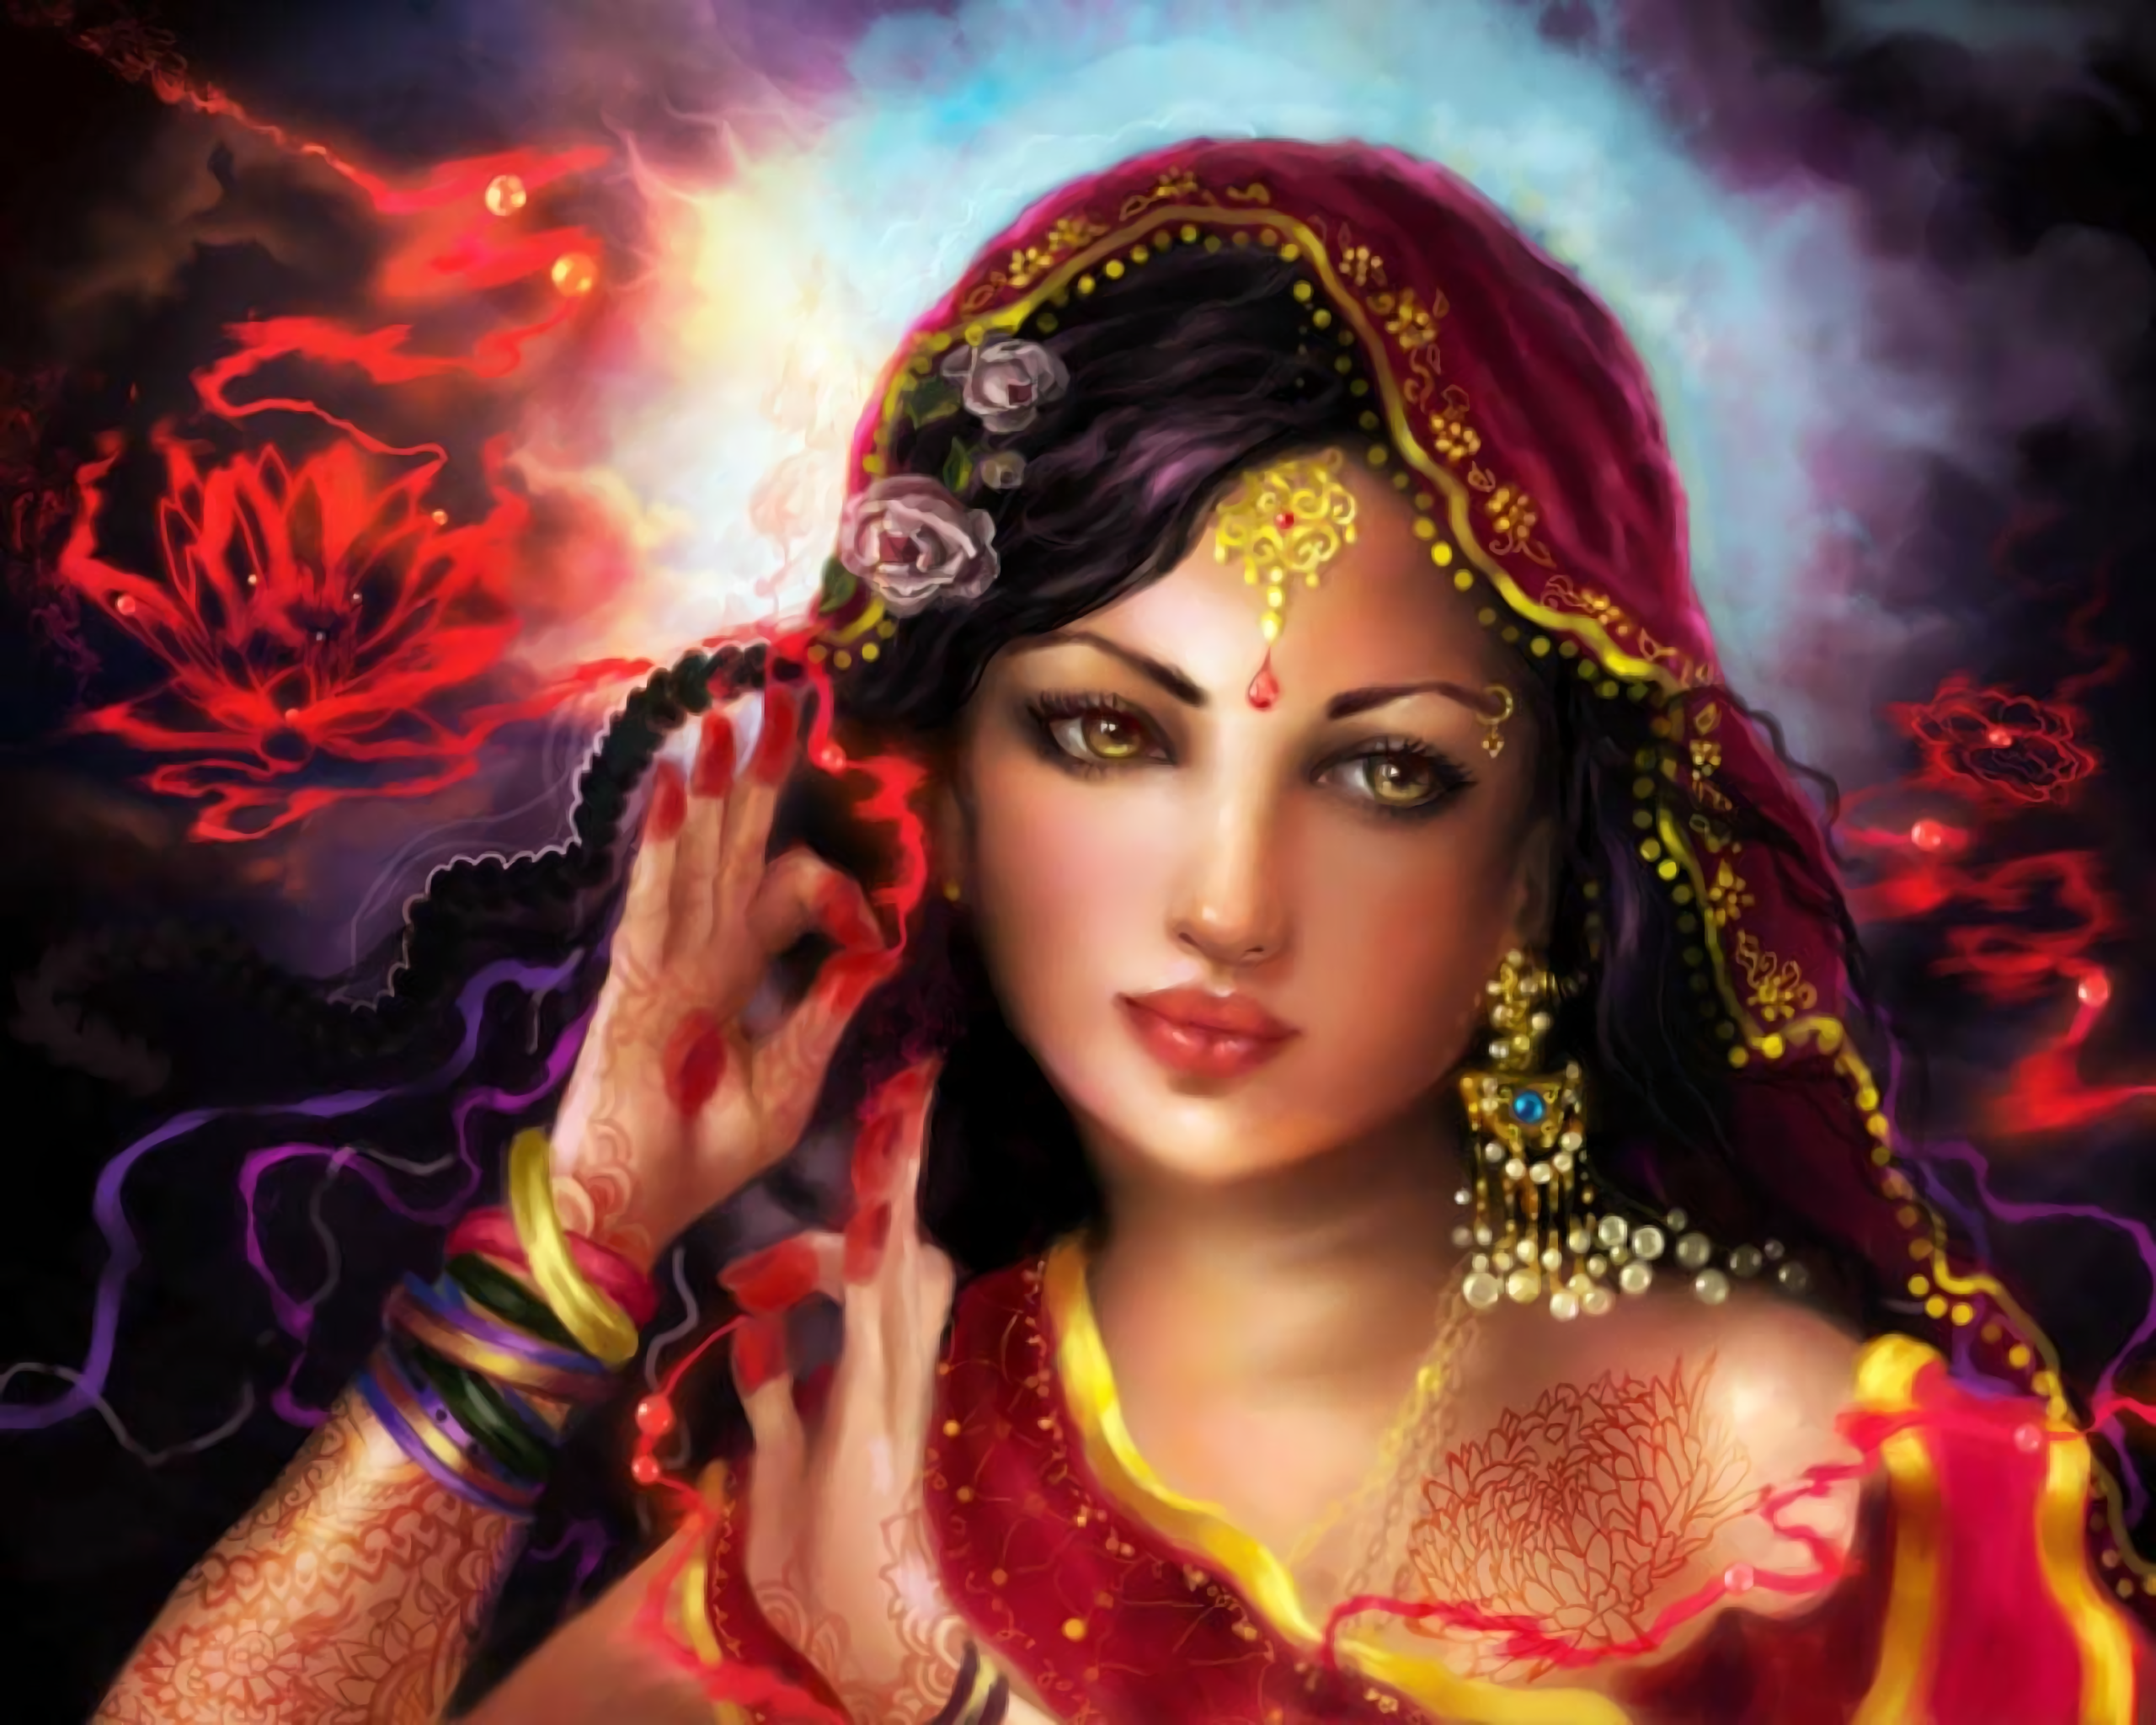 Fantasy girl hd wallpaper background image 2560x2048 - Indian ladies wallpaper ...